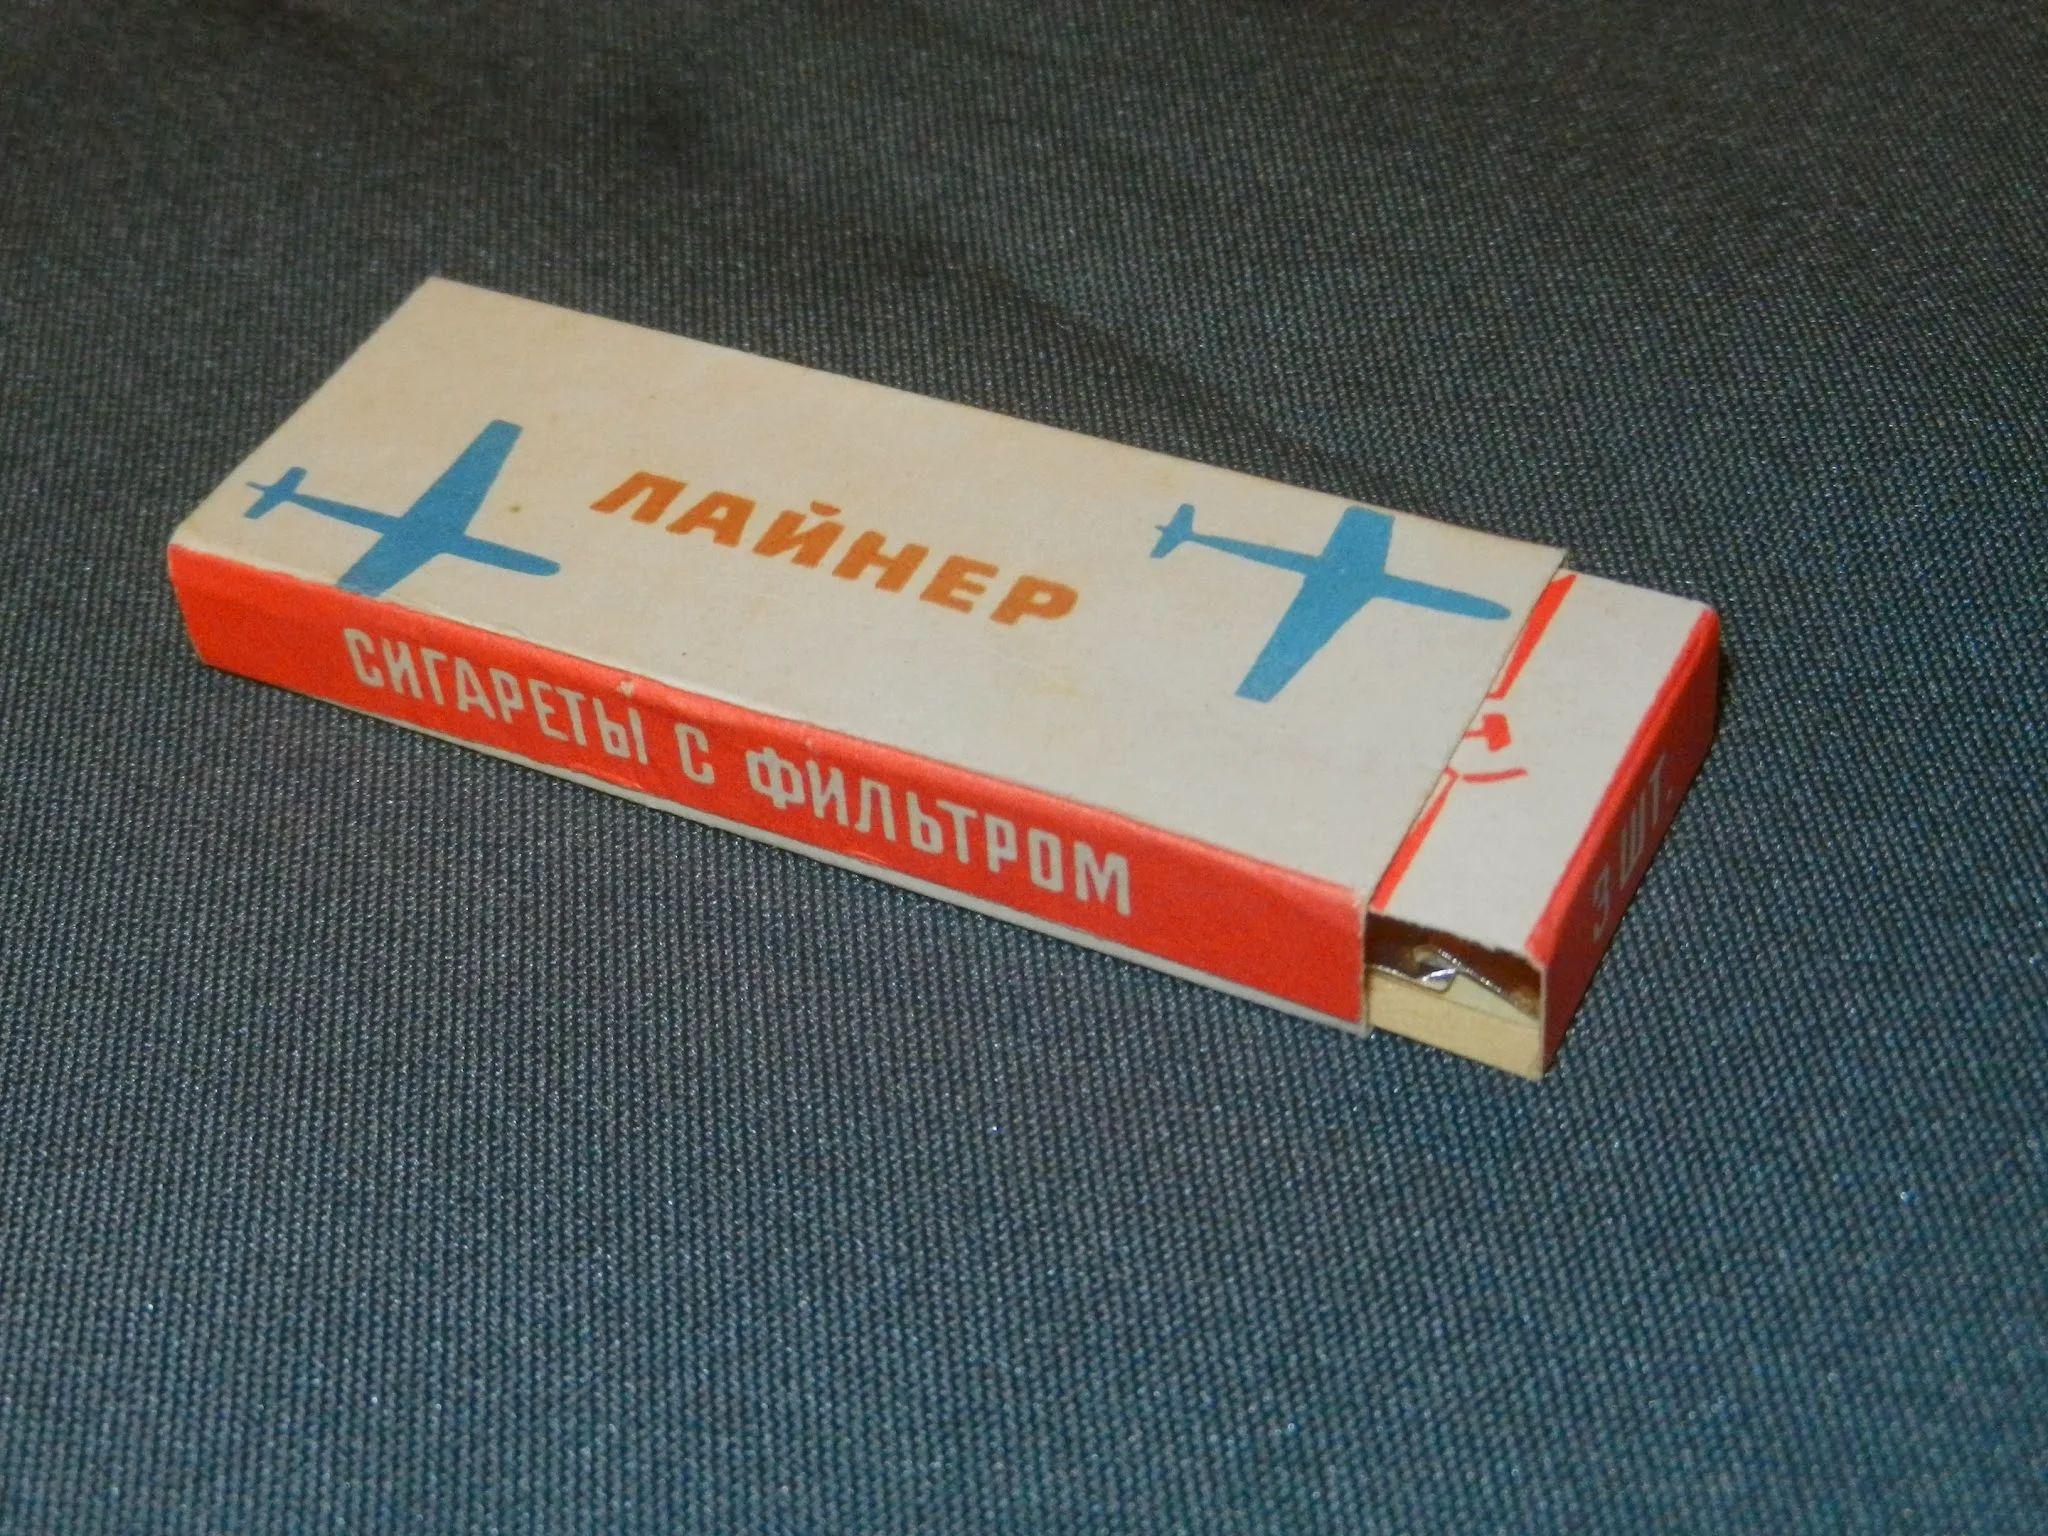 17. Коробка Аэрофлота с тремя сигаретами